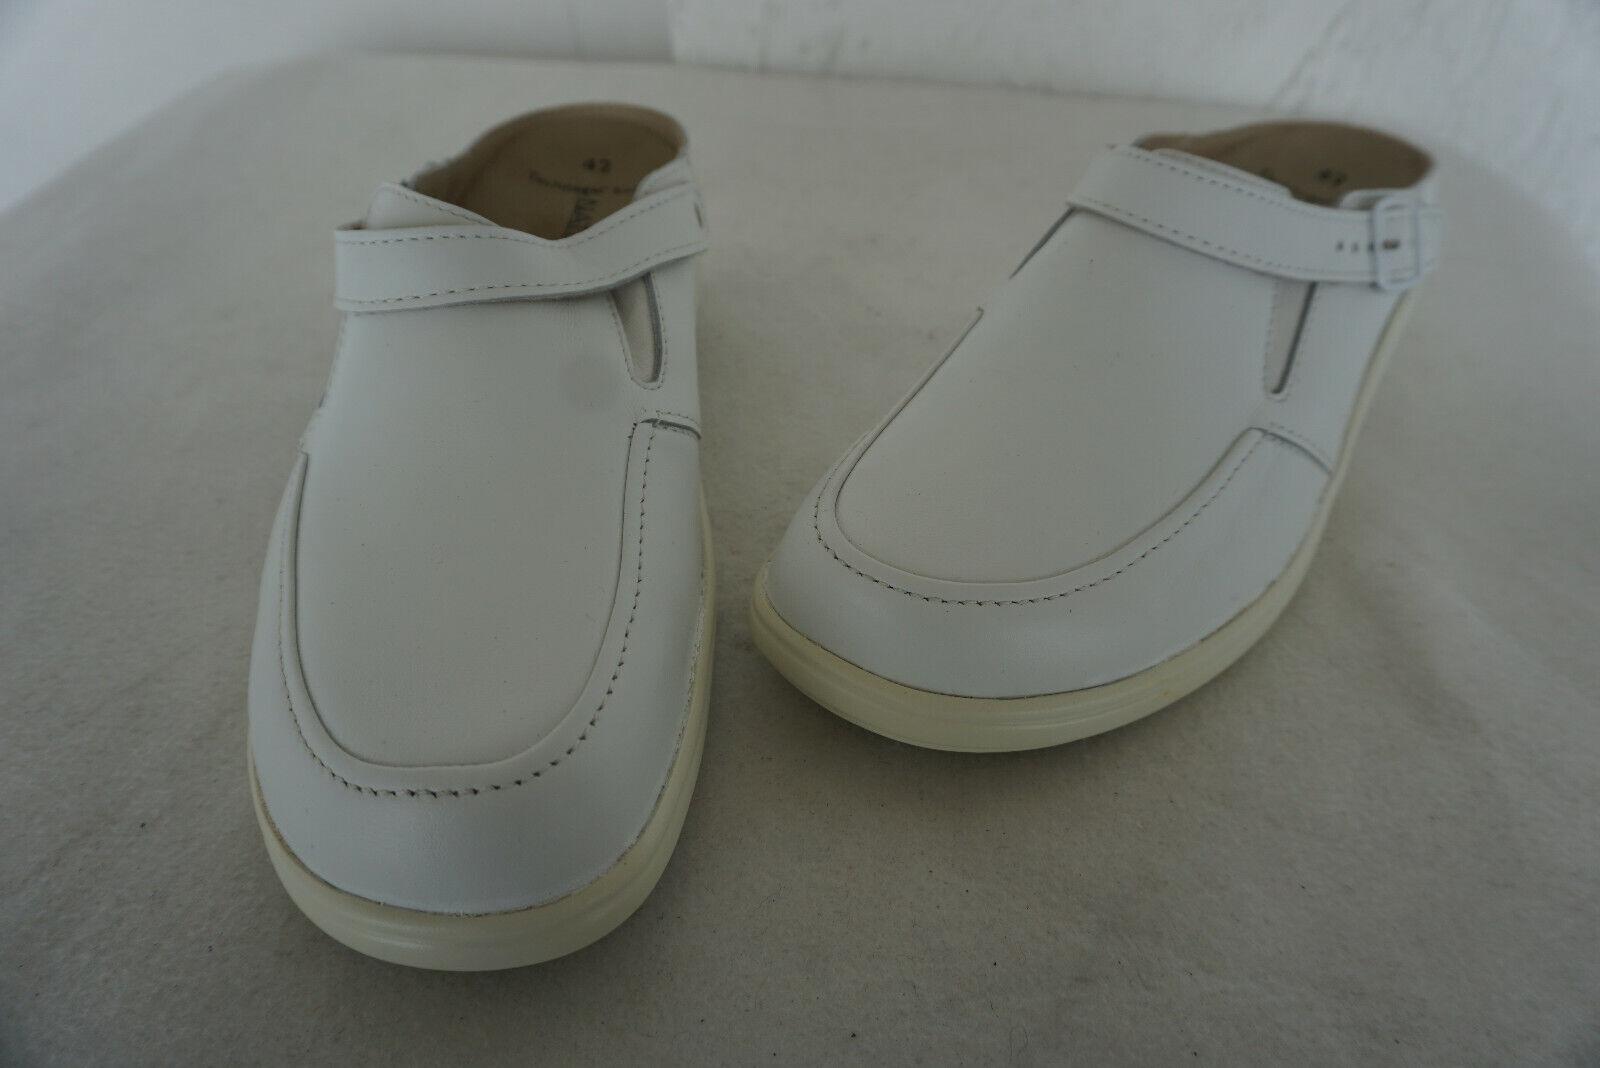 Orthopädisch Natural Feet Femmes Sandale Chaussure Clog pratique Taille 42 H en cuir blanc NEUF